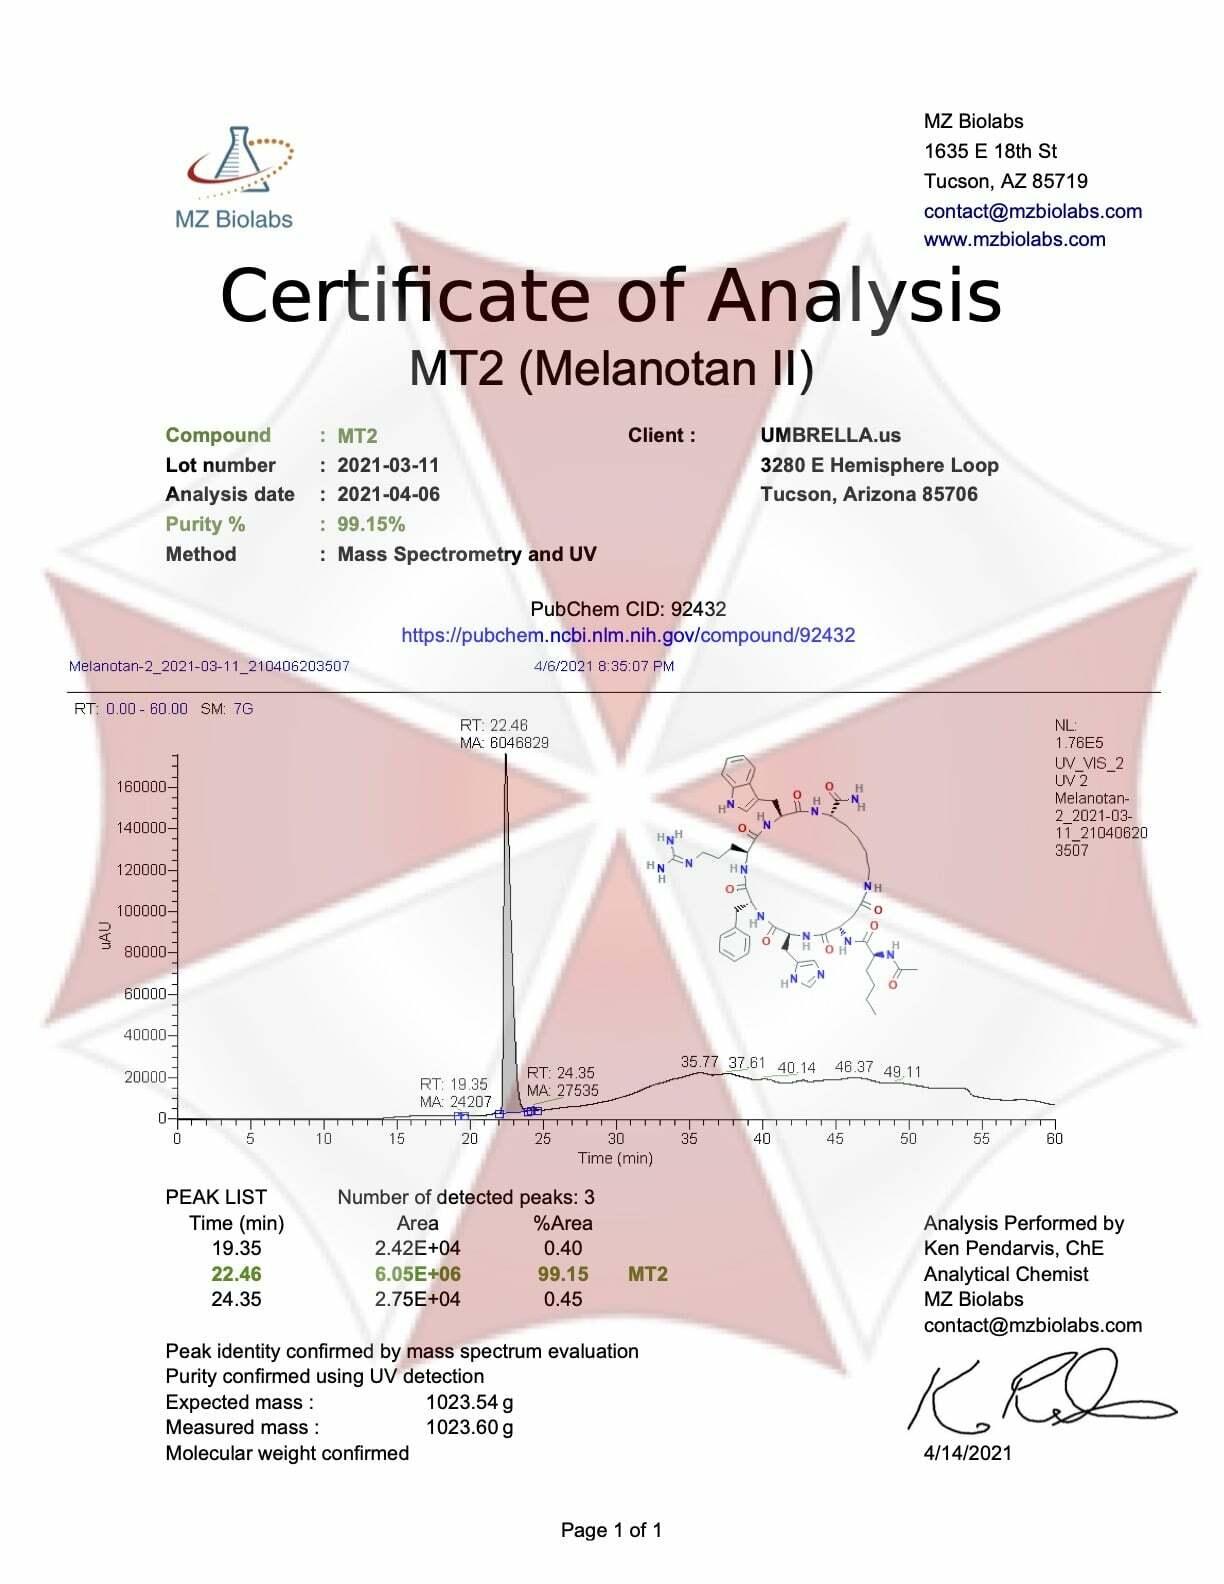 MELANOTAN II Certificate of Authenticity